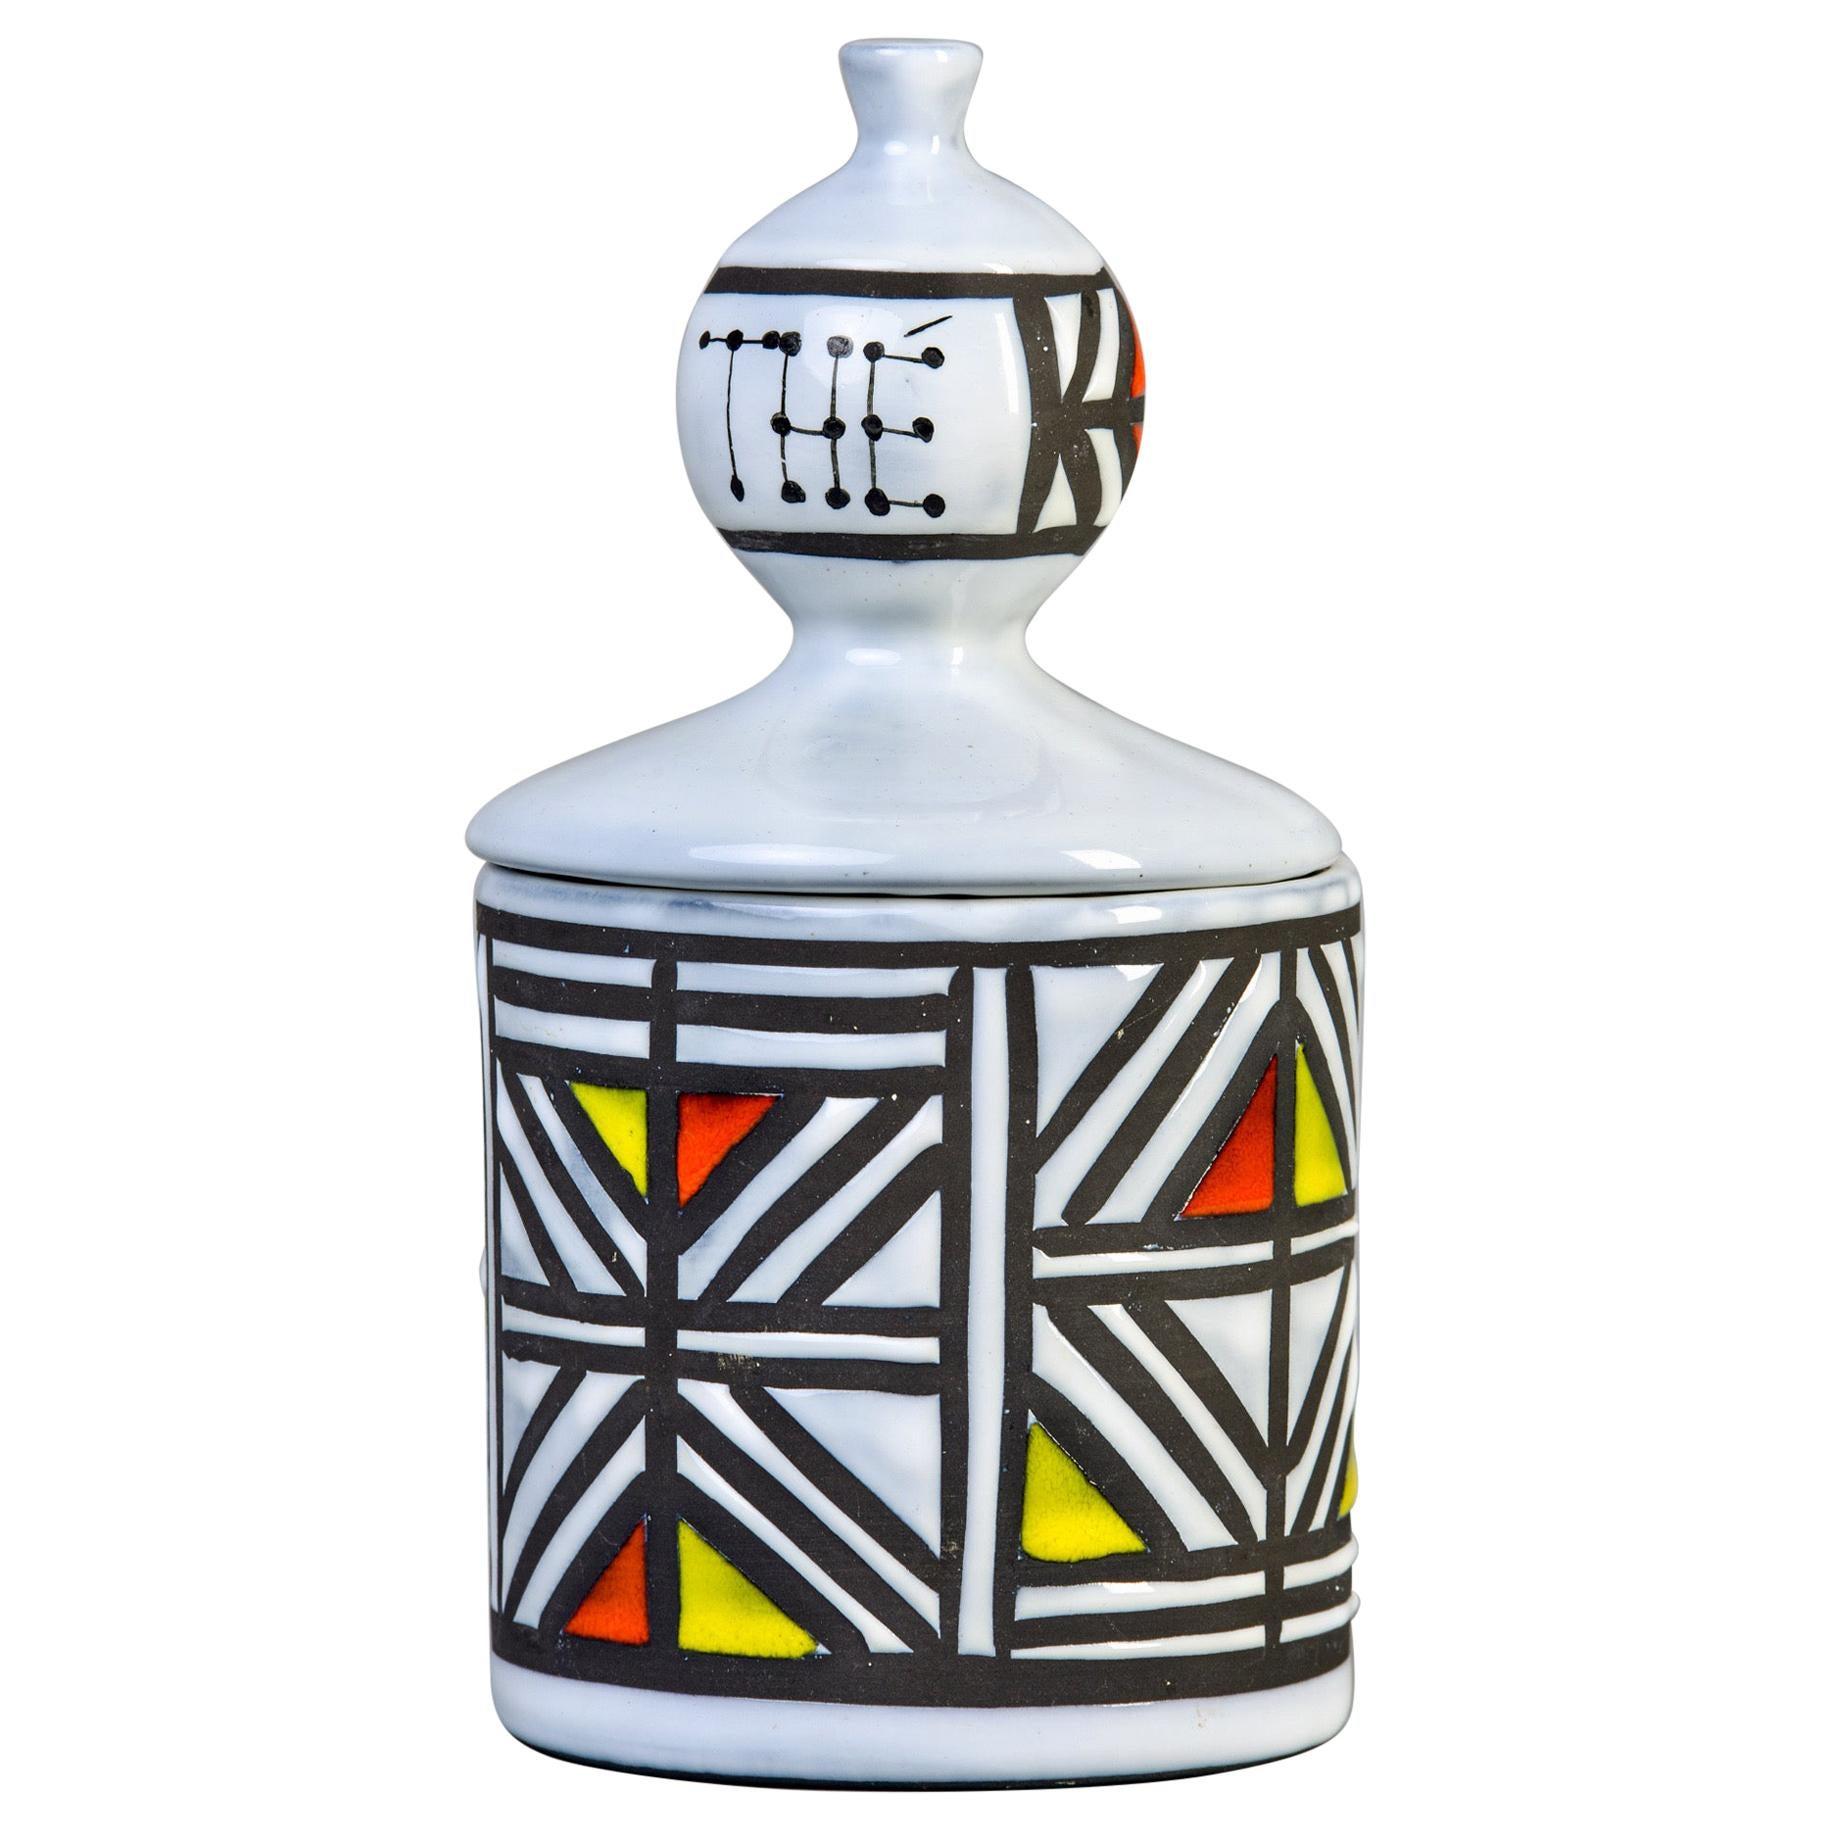 Signed Roger Capron Ceramic Tea Canister Vallauris France